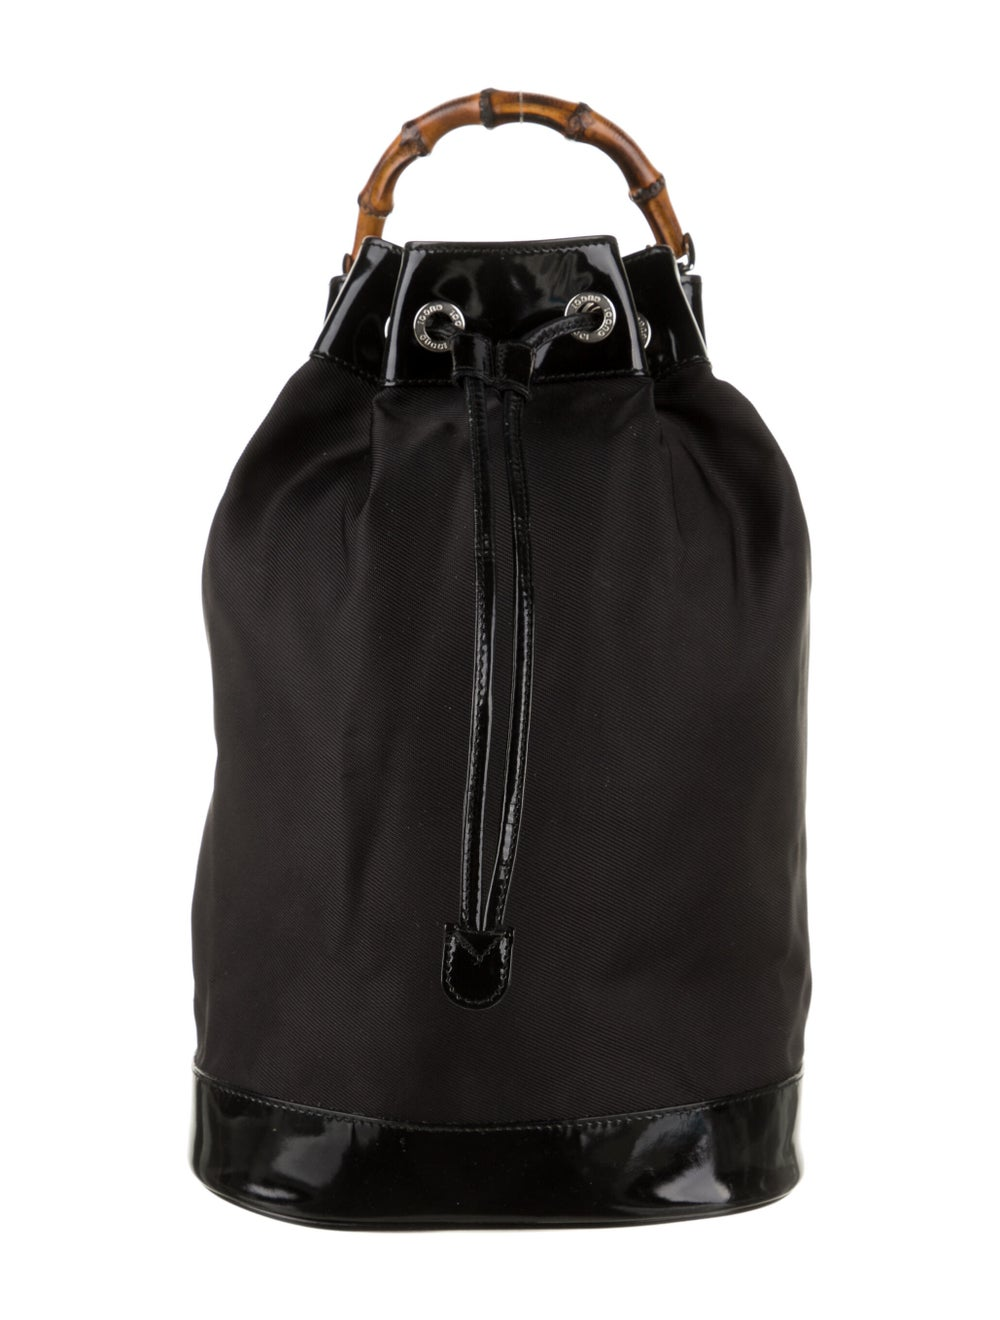 Gucci Vintage Bamboo Nylon Sling Bag Black - image 1